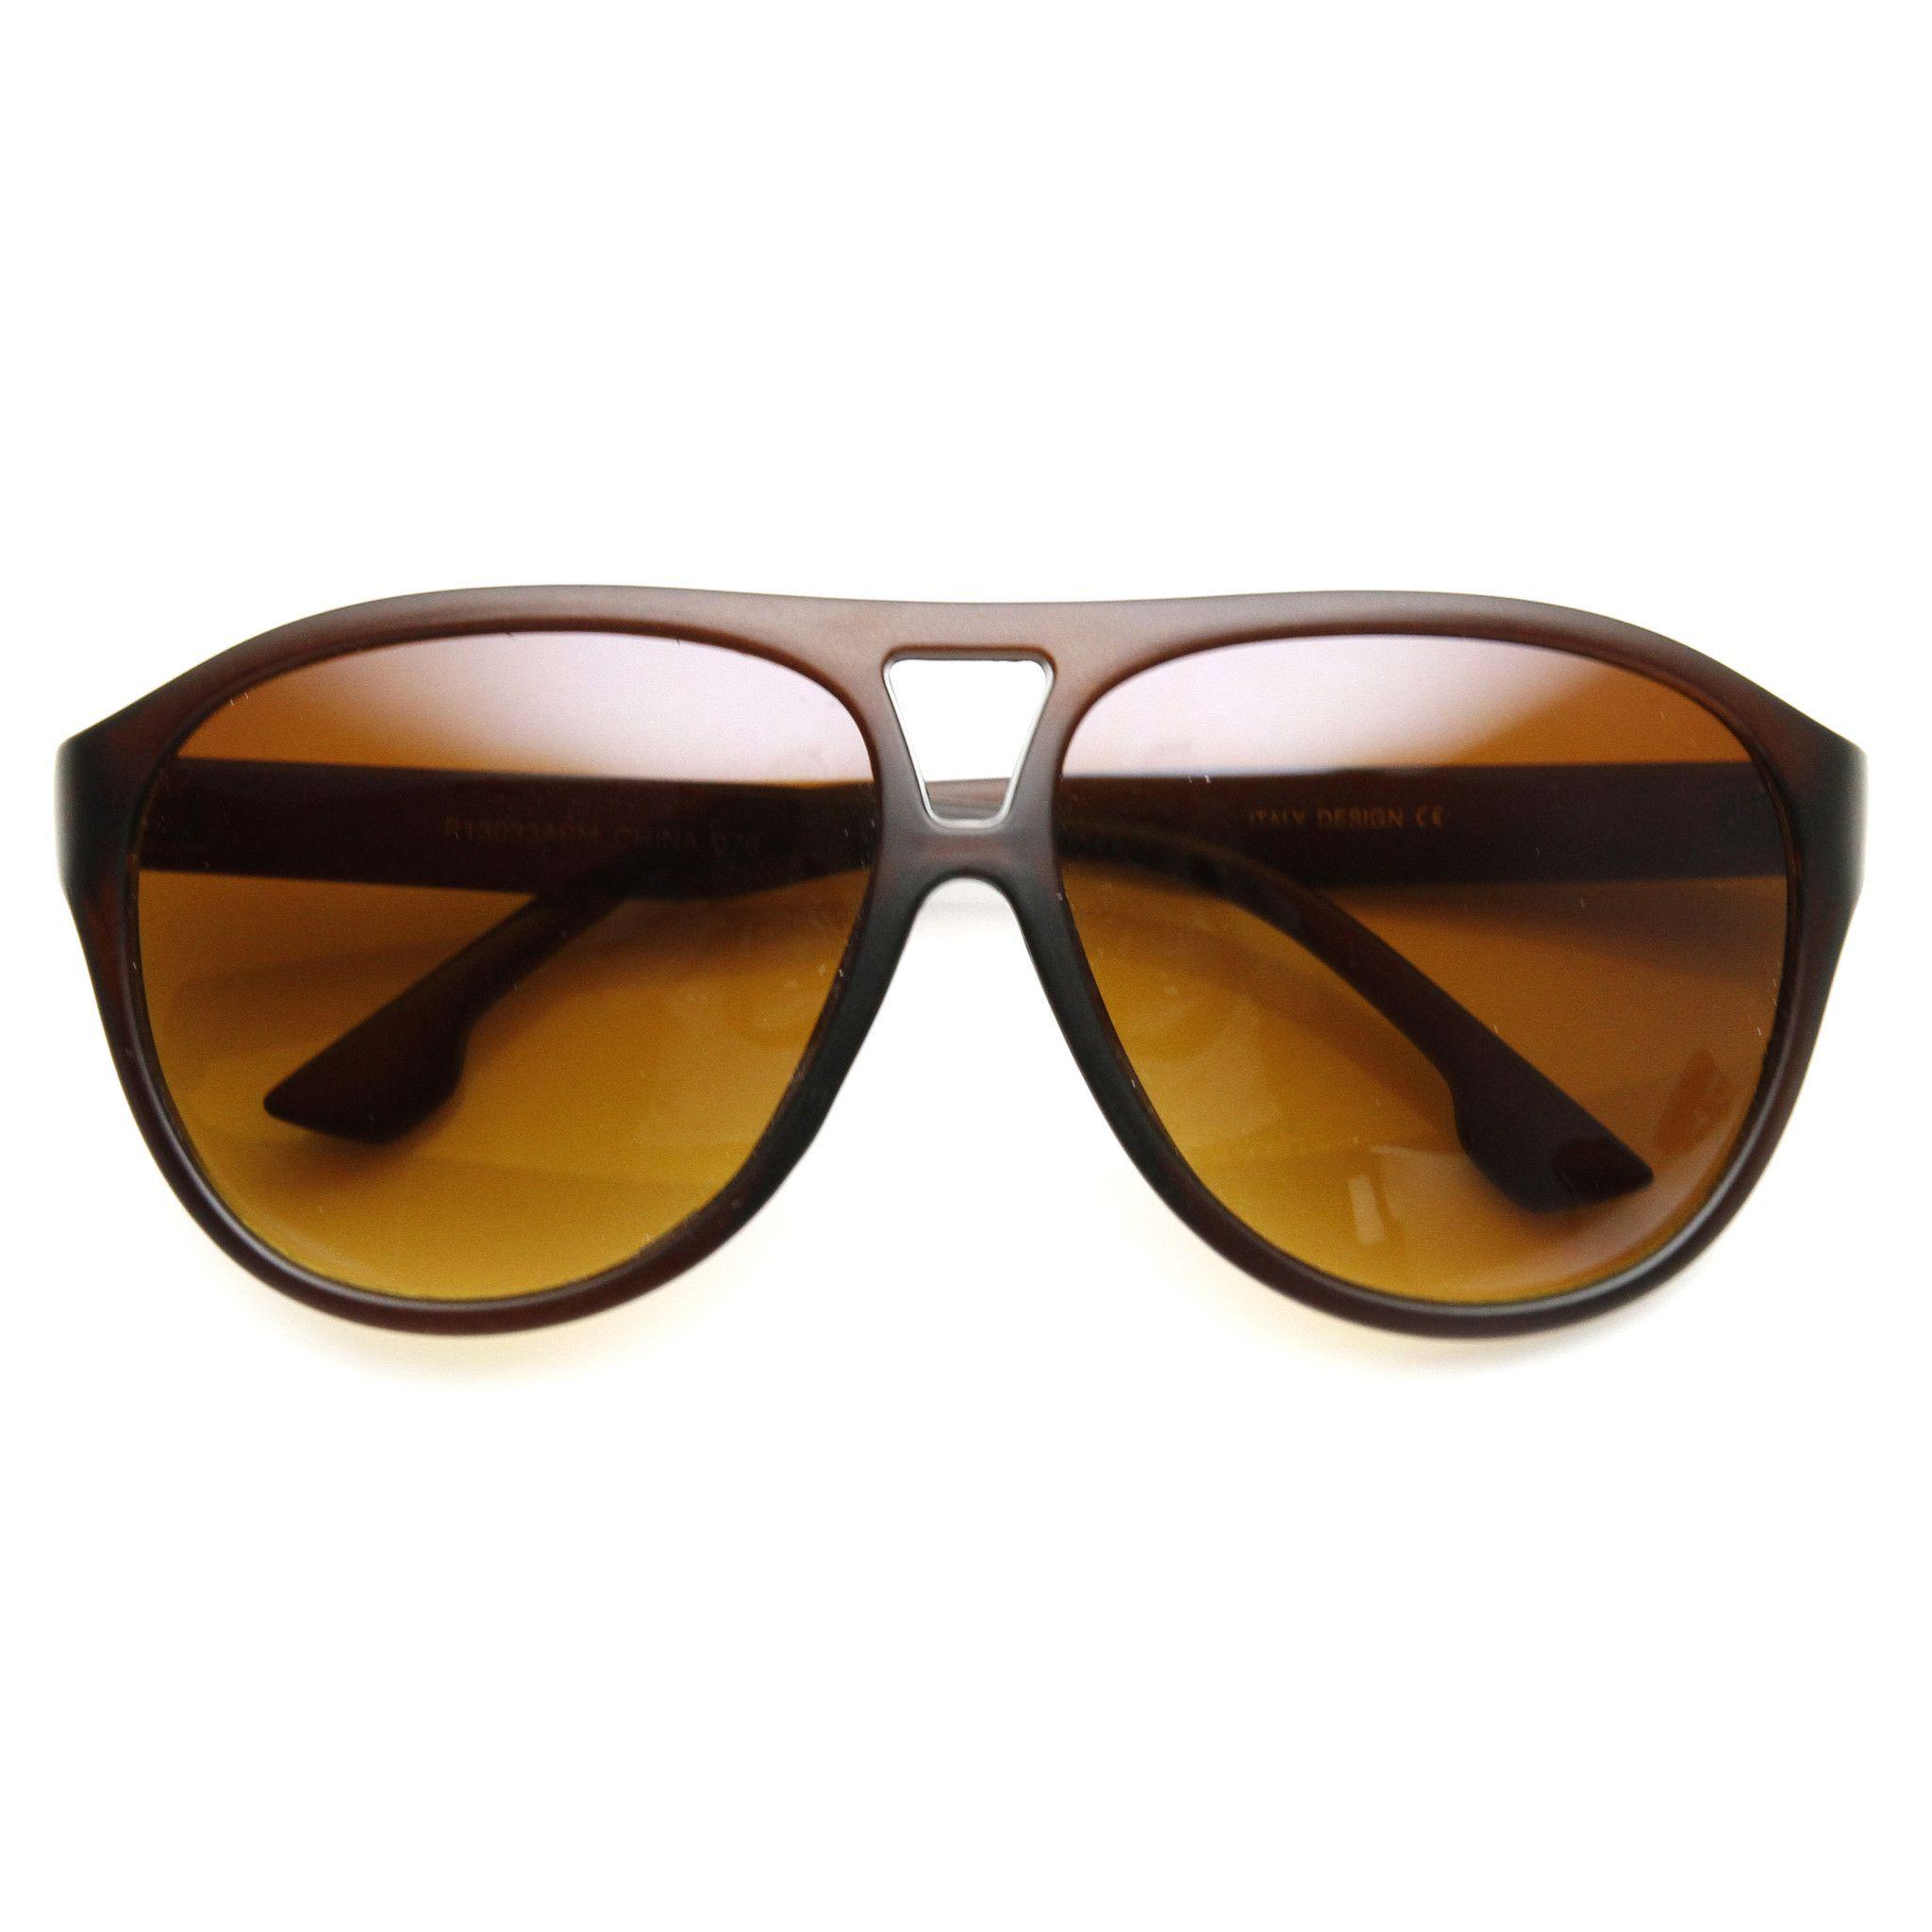 Retro Modern Oversize Fashion Aviator Sunglasses 9390 | zeroUV